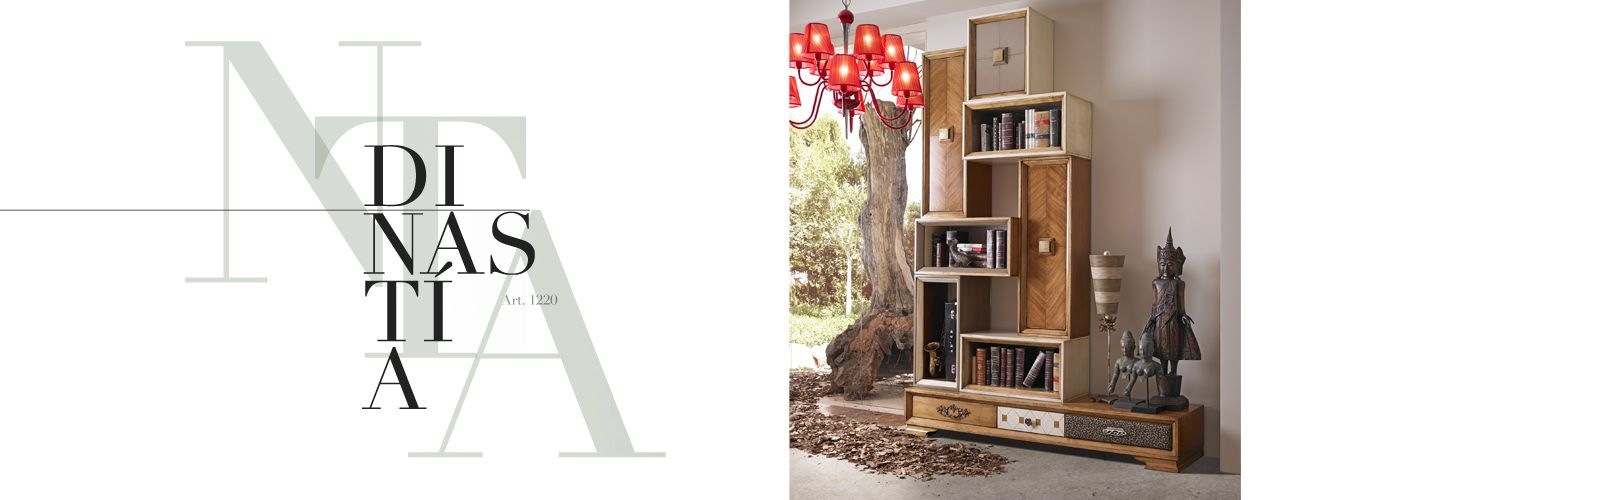 Librero Dinast A De Lola Glamour Bookcases Handmade Dinast A  # Muebles Lola Mora